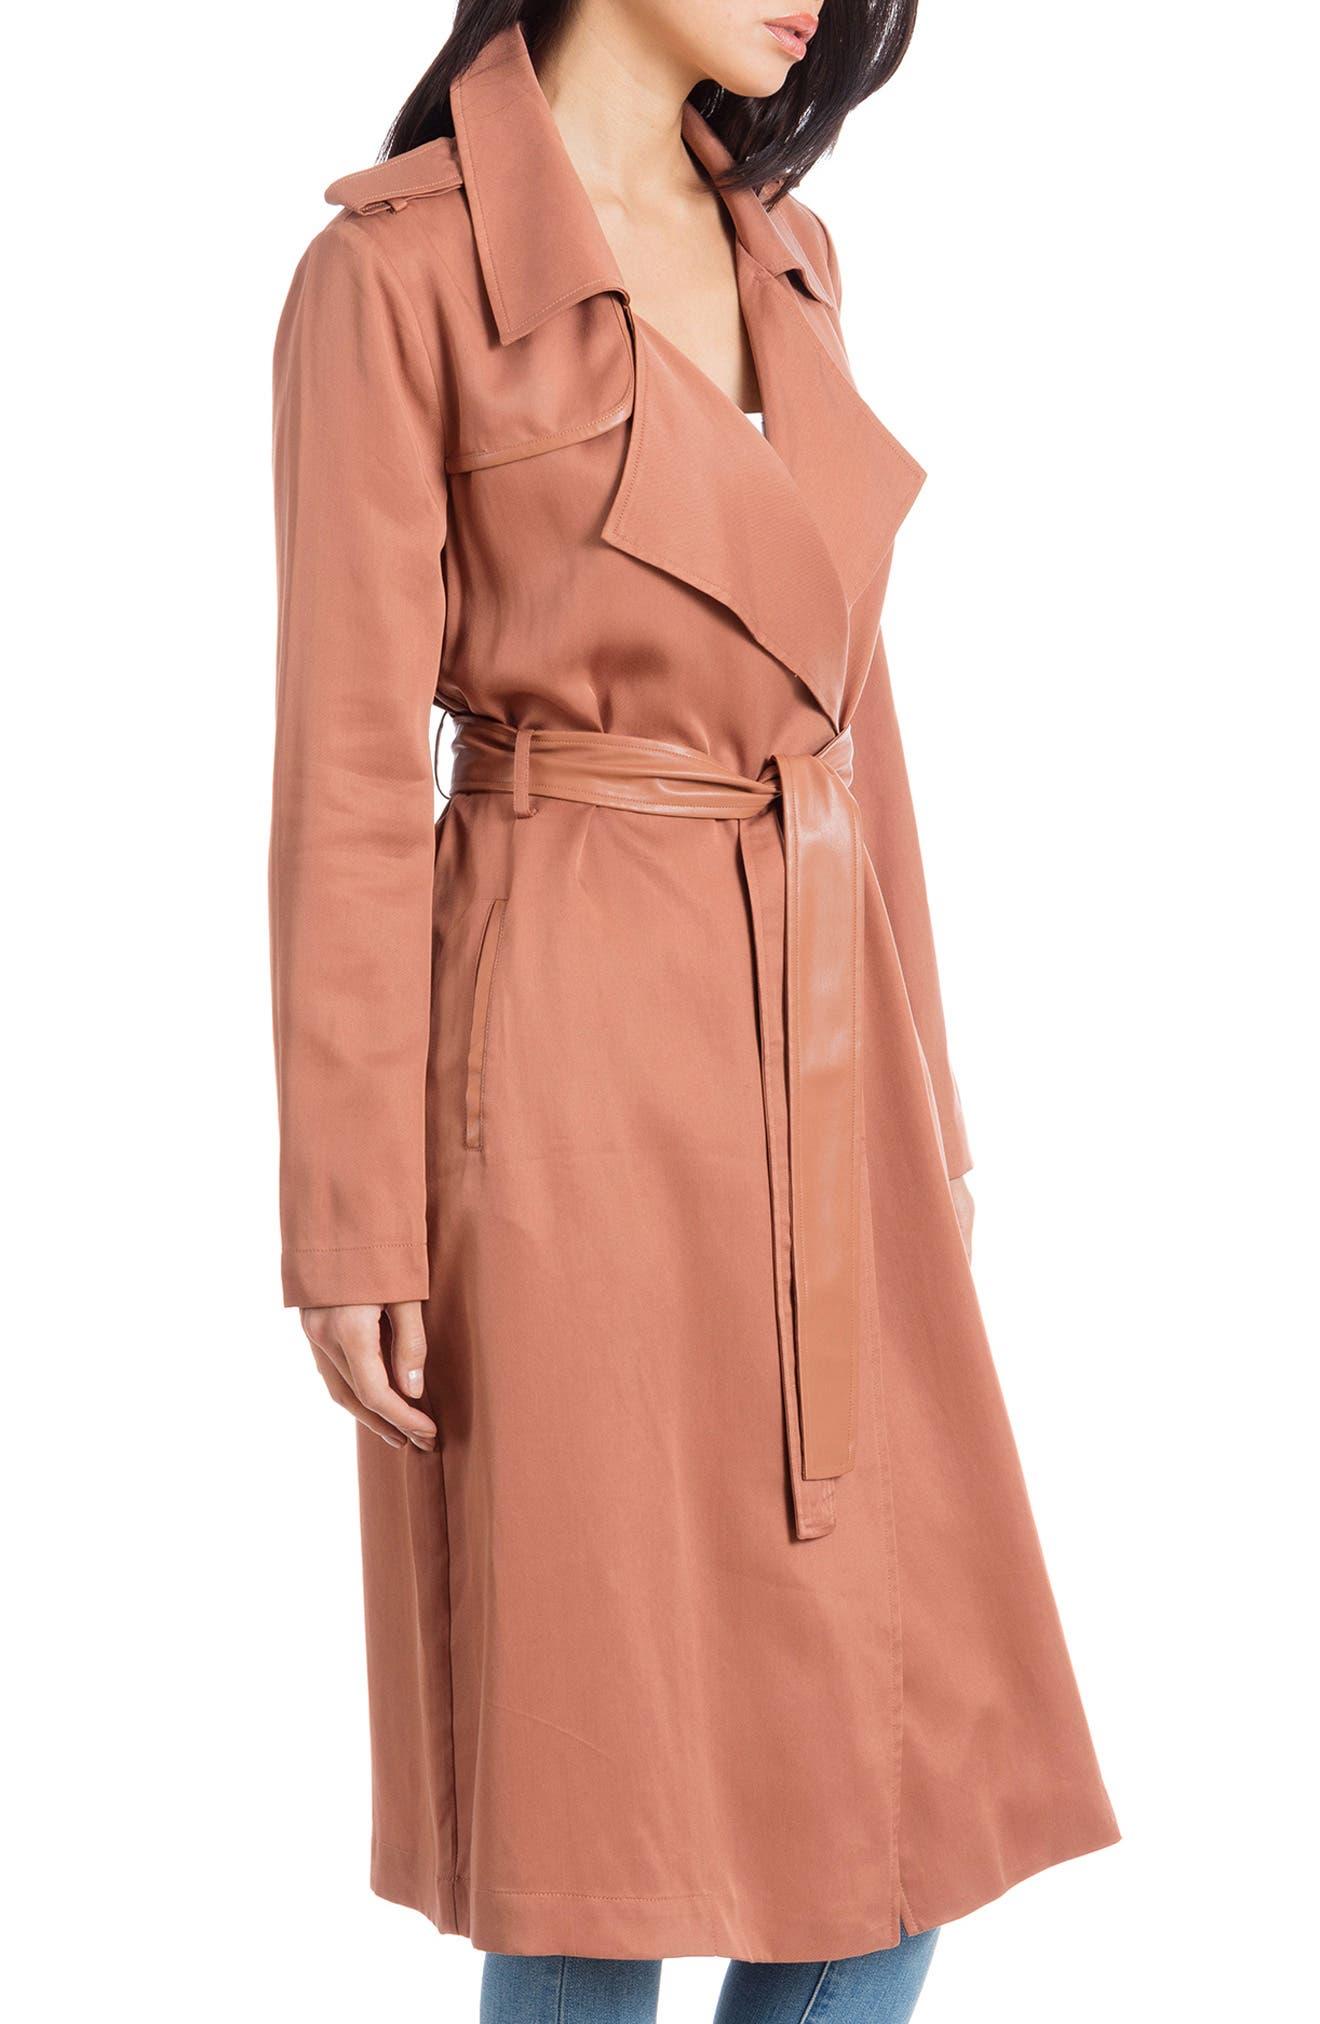 Badgley Mischka Faux Leather Trim Long Trench Coat,                             Alternate thumbnail 3, color,                             CEDAR